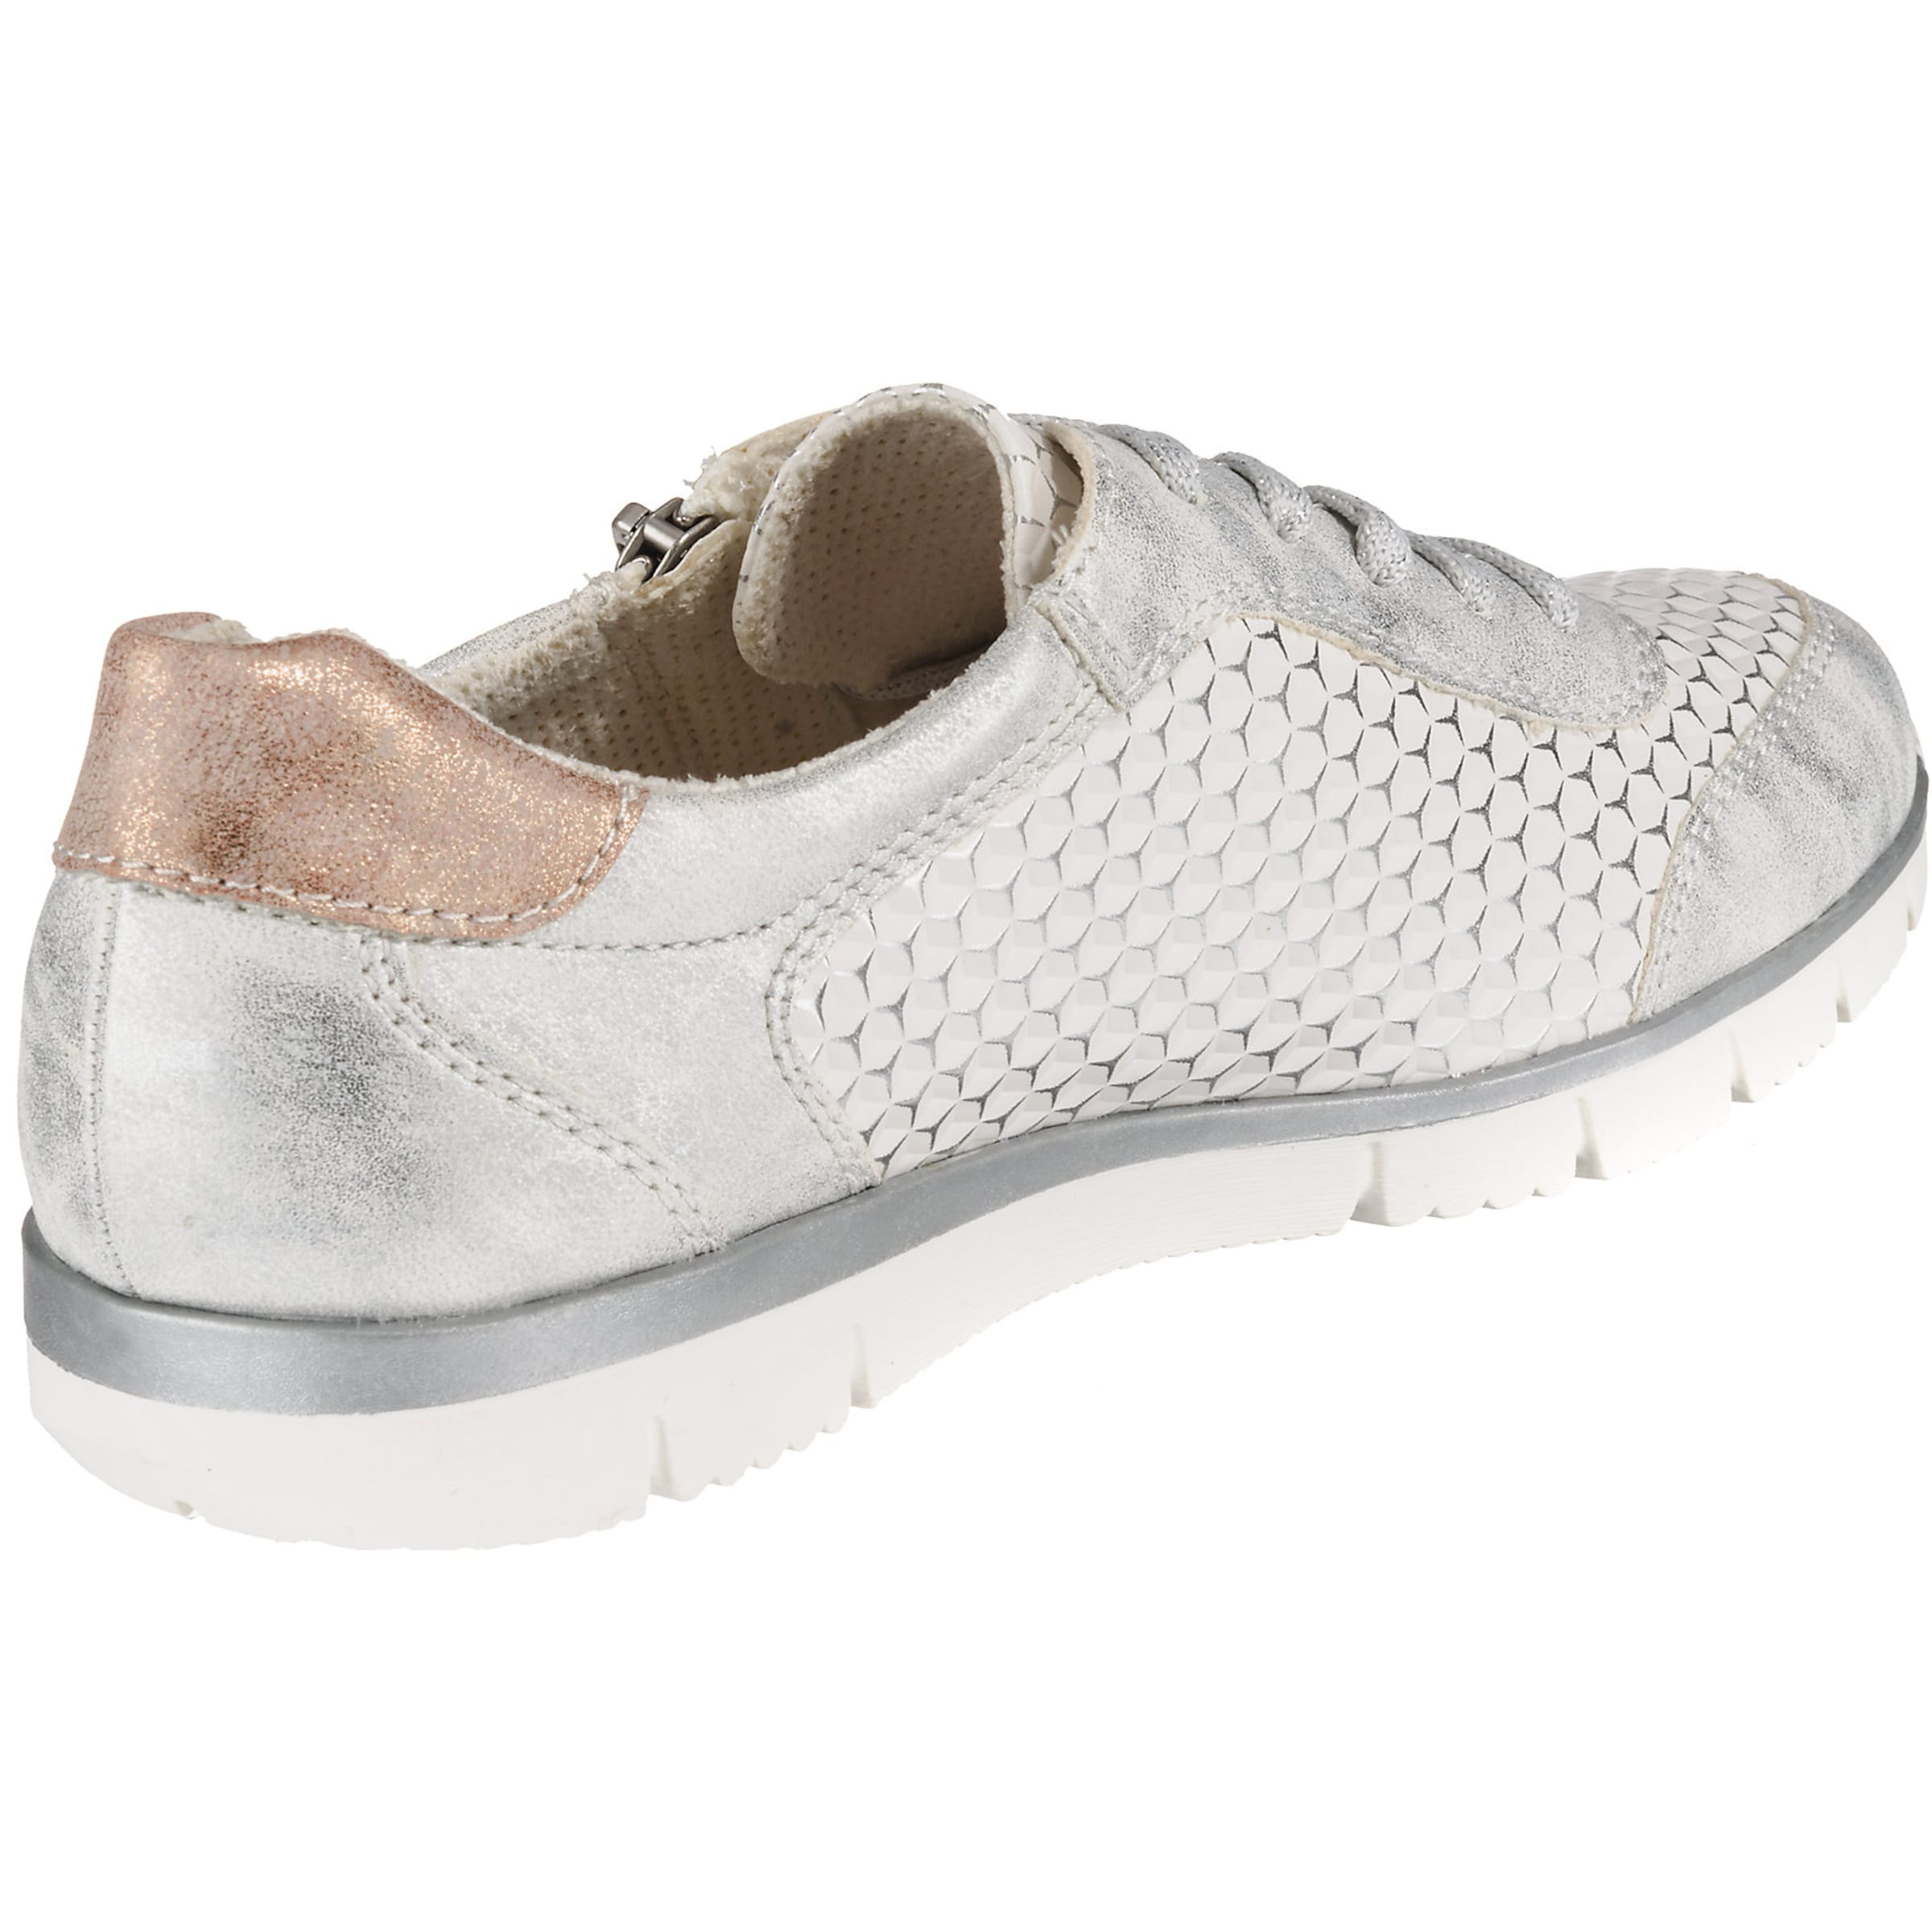 SilberWeiß Sneakers Low Sylt In Gosch MGzjVLqpSU